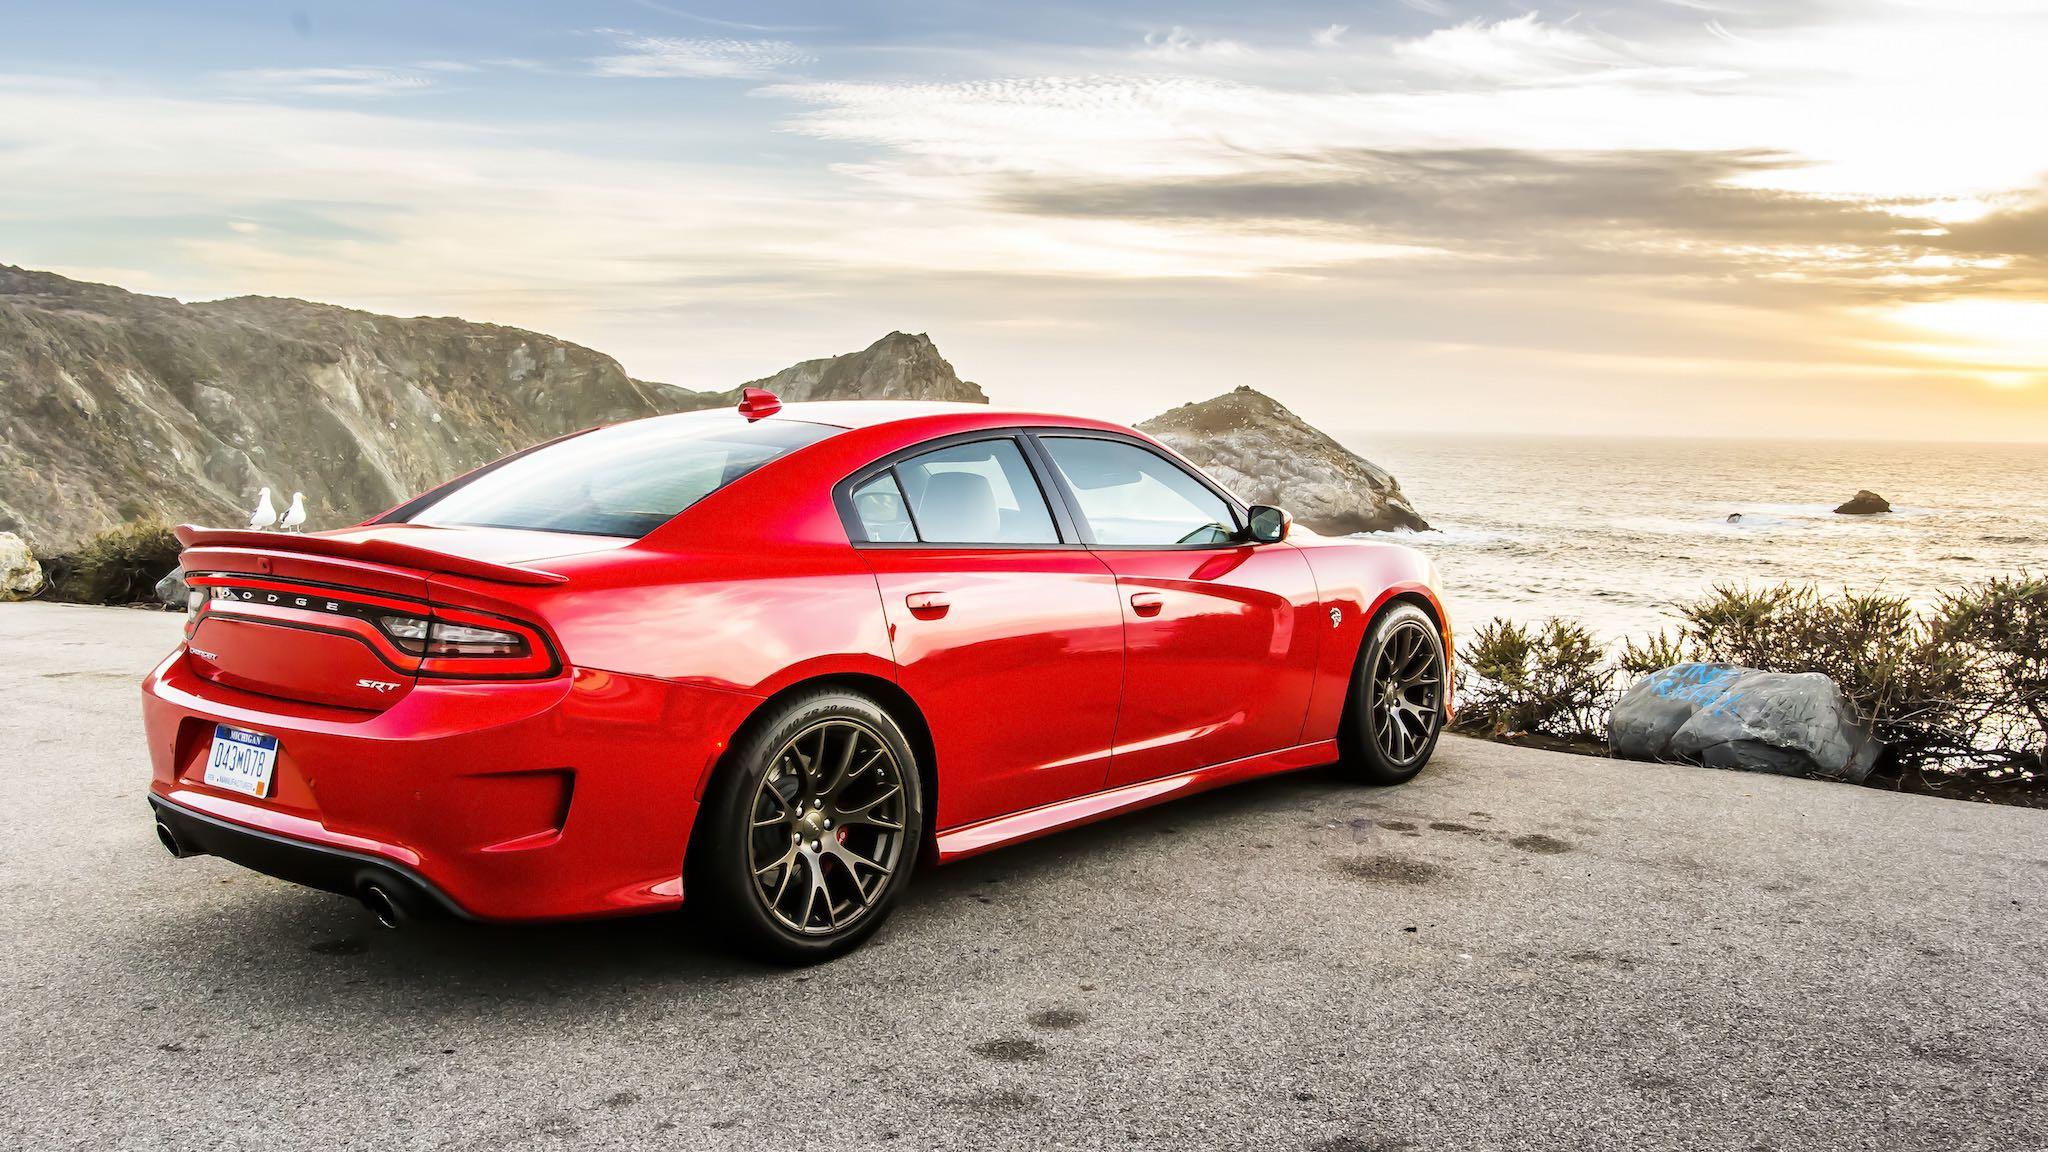 Challenger Srt Hellcat >> Dodge Charger SRT Hellcat Review | CarAdvice